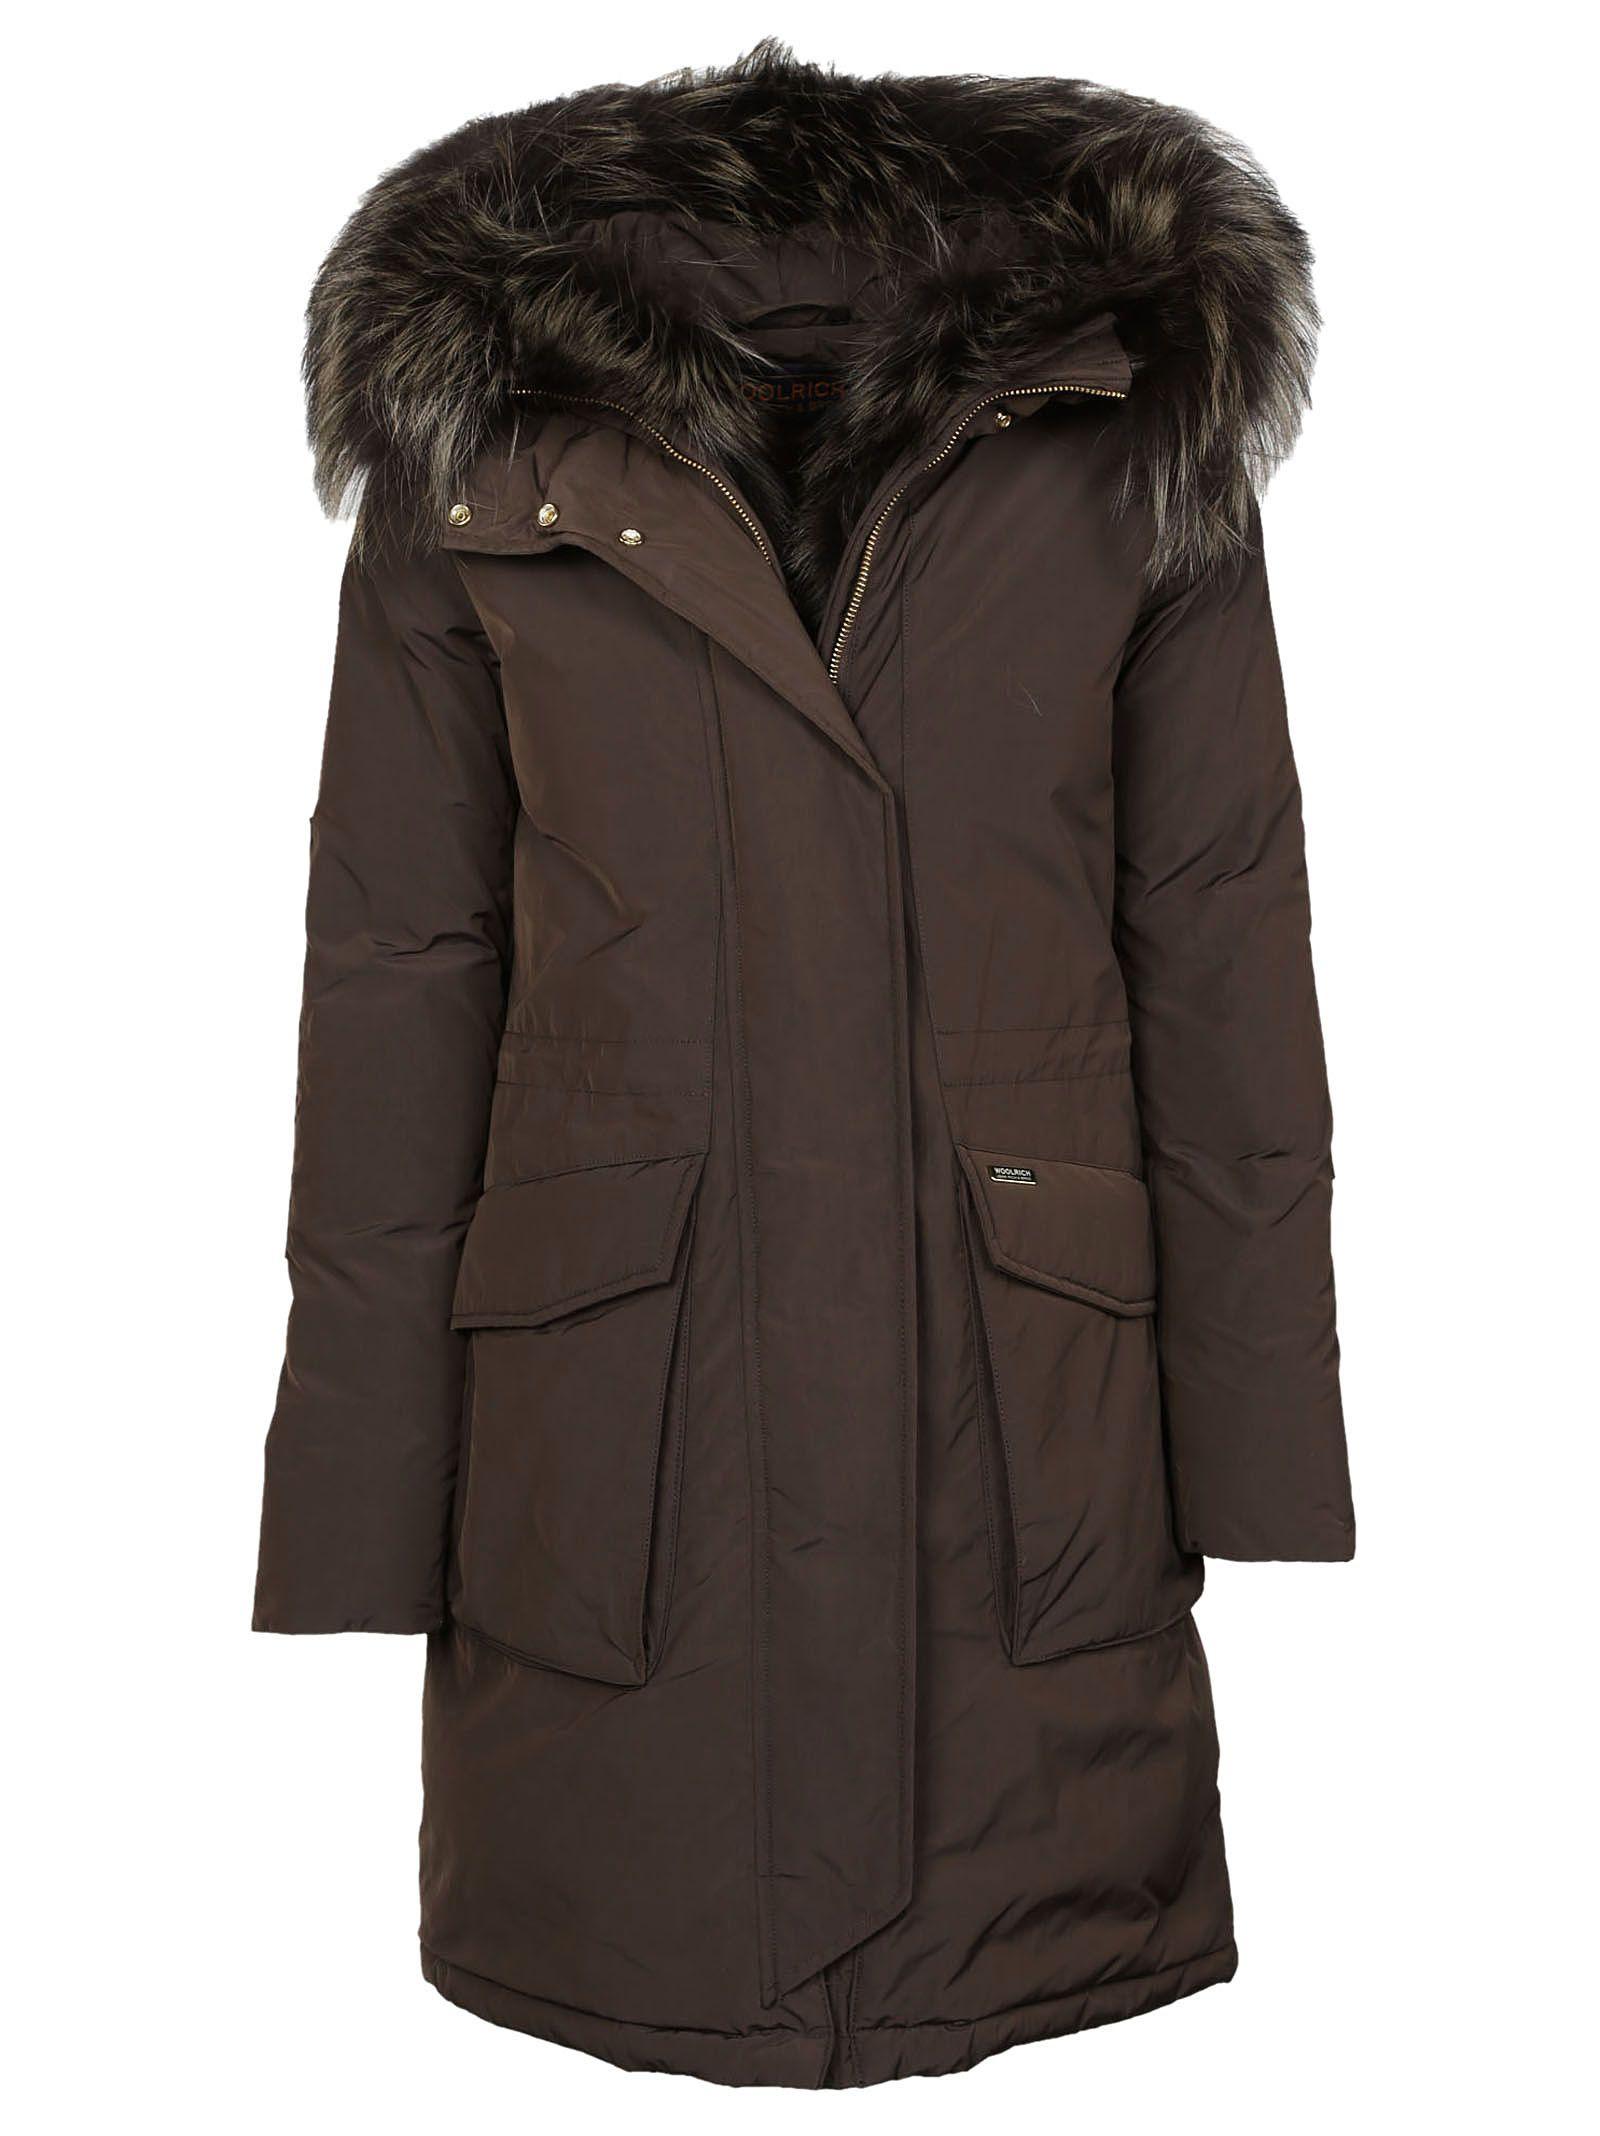 woolrich woolrich military parka brown women 39 s coats. Black Bedroom Furniture Sets. Home Design Ideas